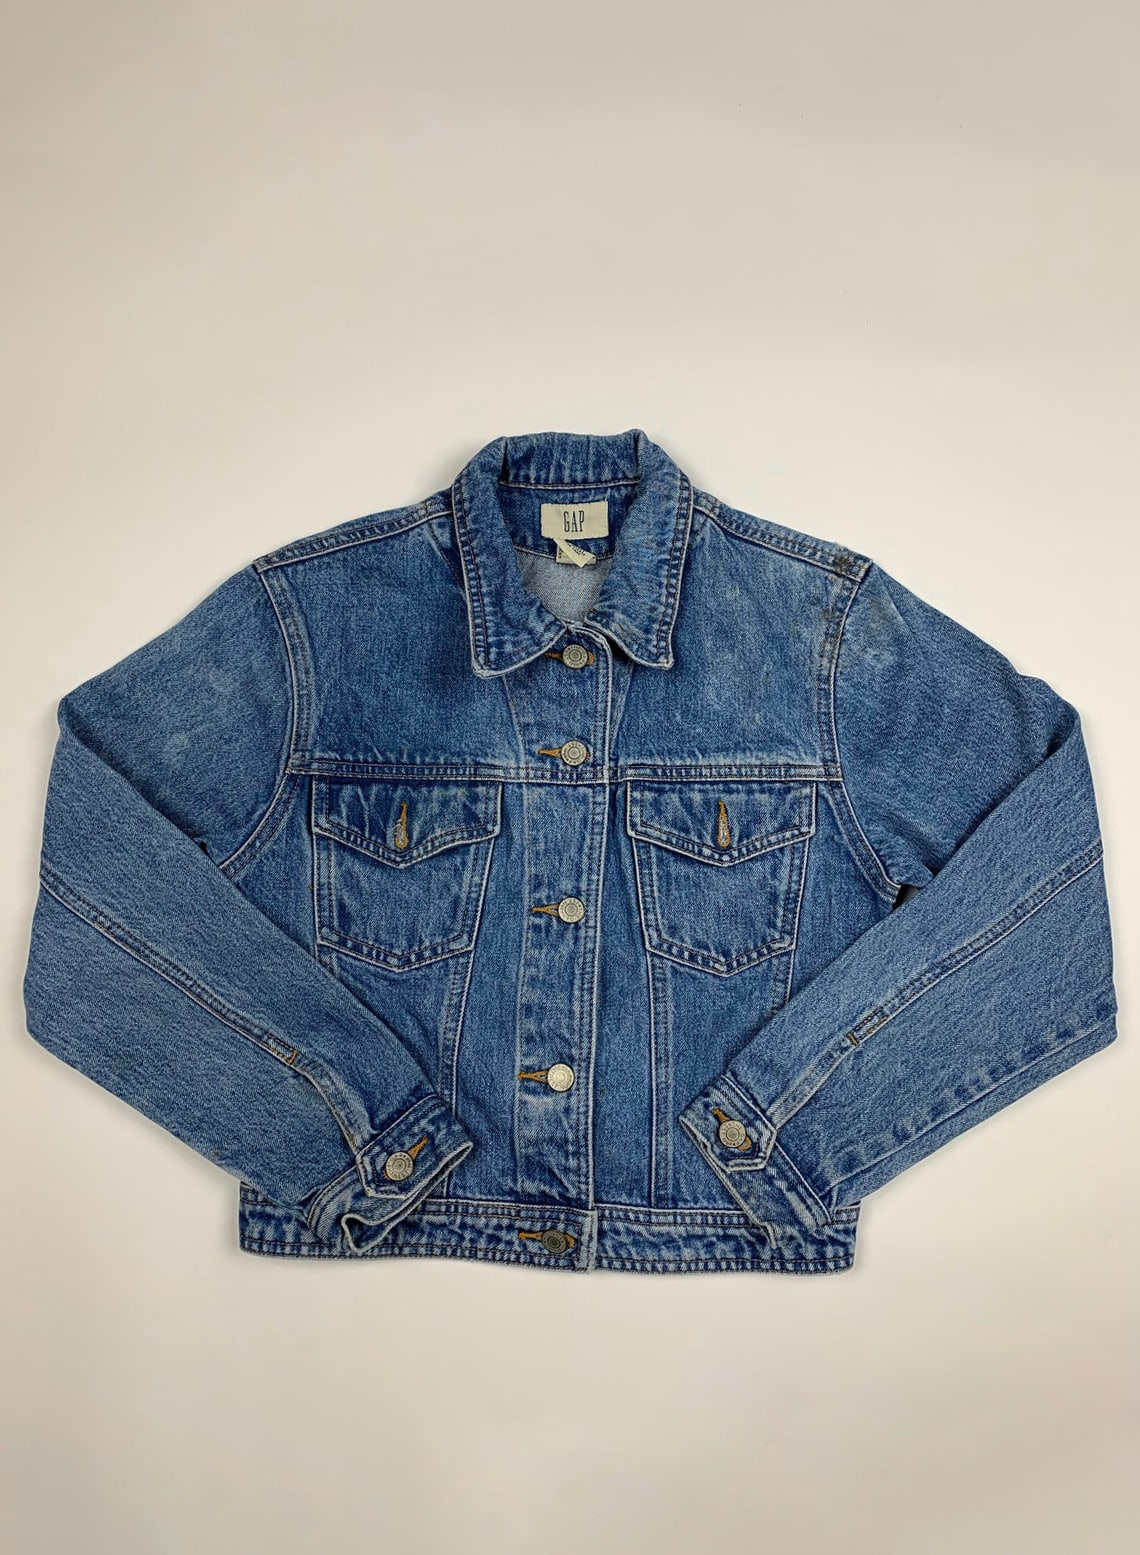 Vintage 90s Gap Retro Denim Jean Jacket